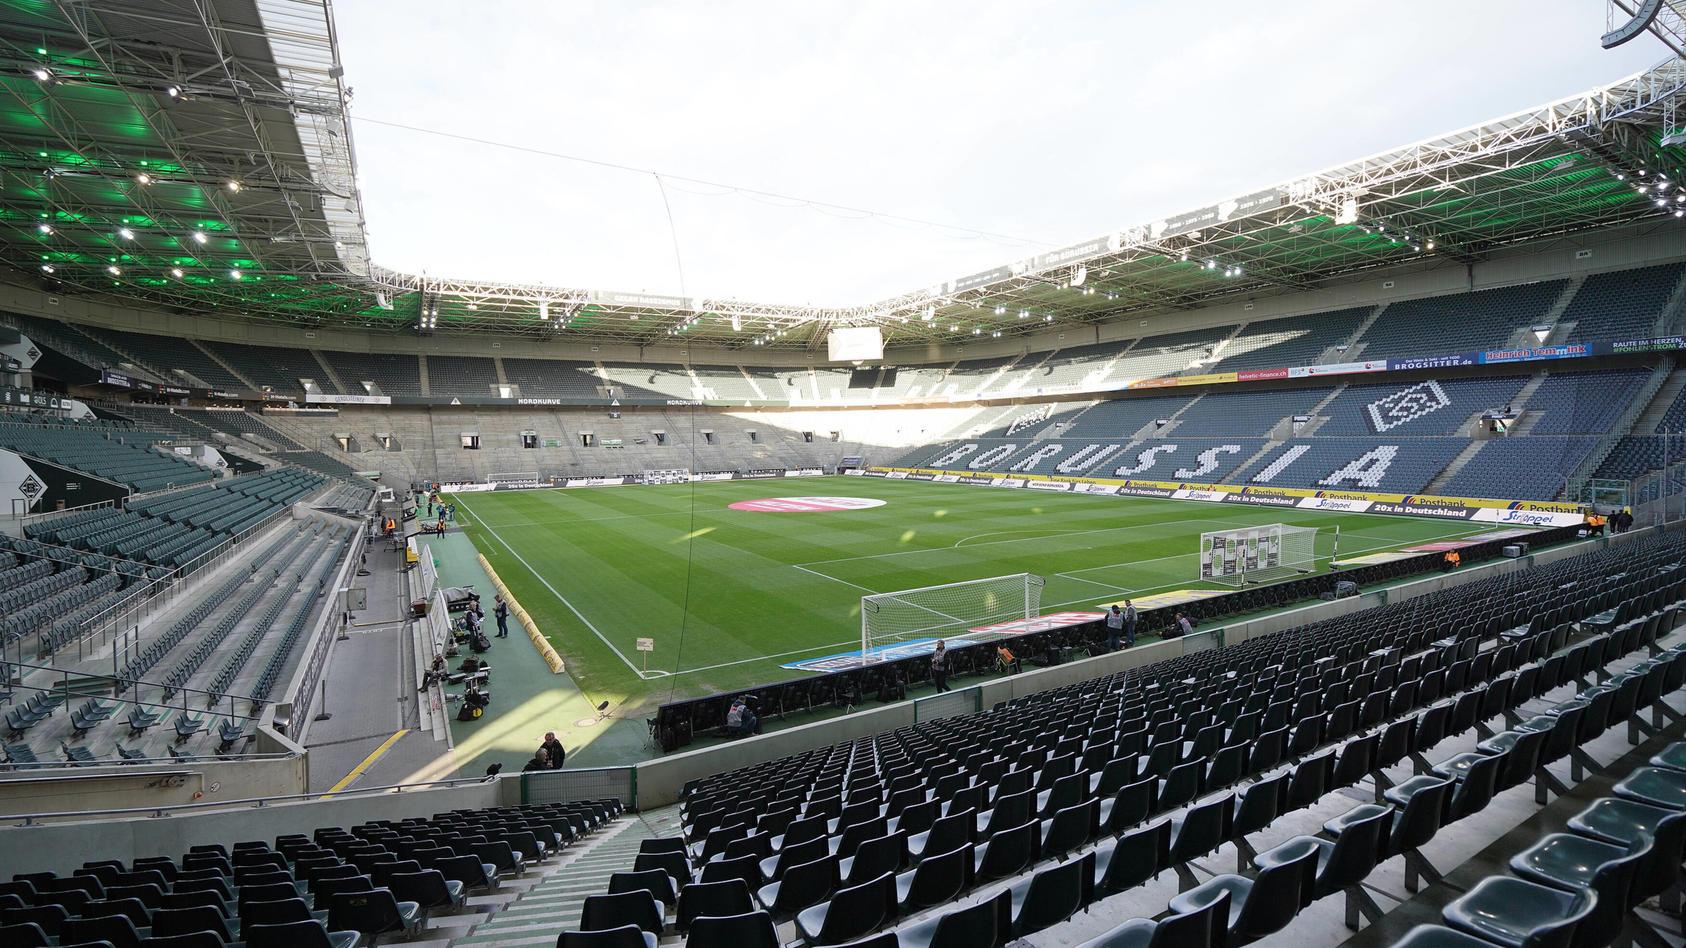 GER, 1. FBL, Borussia Moenchengladbach vs. 1. FC Koeln / 11.03.2020, Borussia Park , Moenchengladbach, GER, 1. FBL, Bor